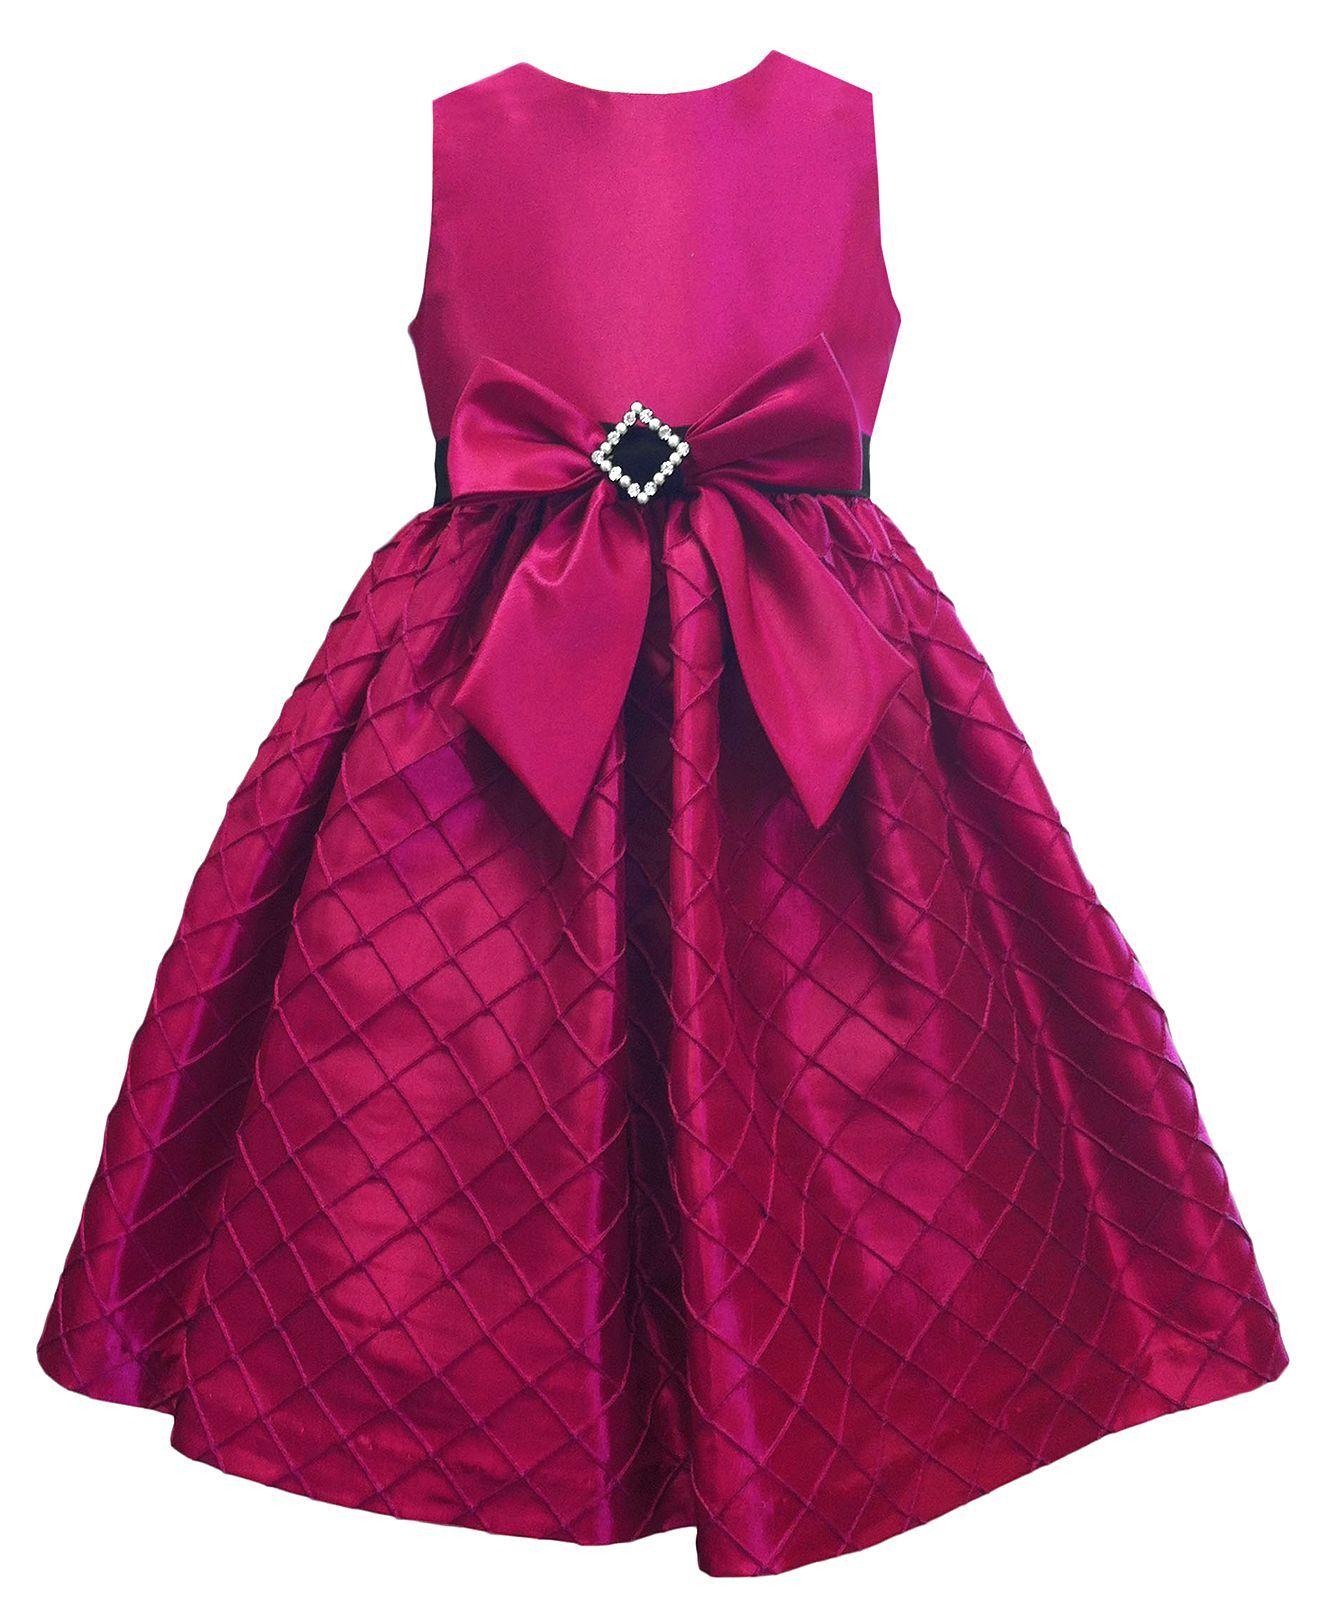 Jayne Coepland Kids Dress, Girls Taffeta Bow Dress - Kids Dresses ...